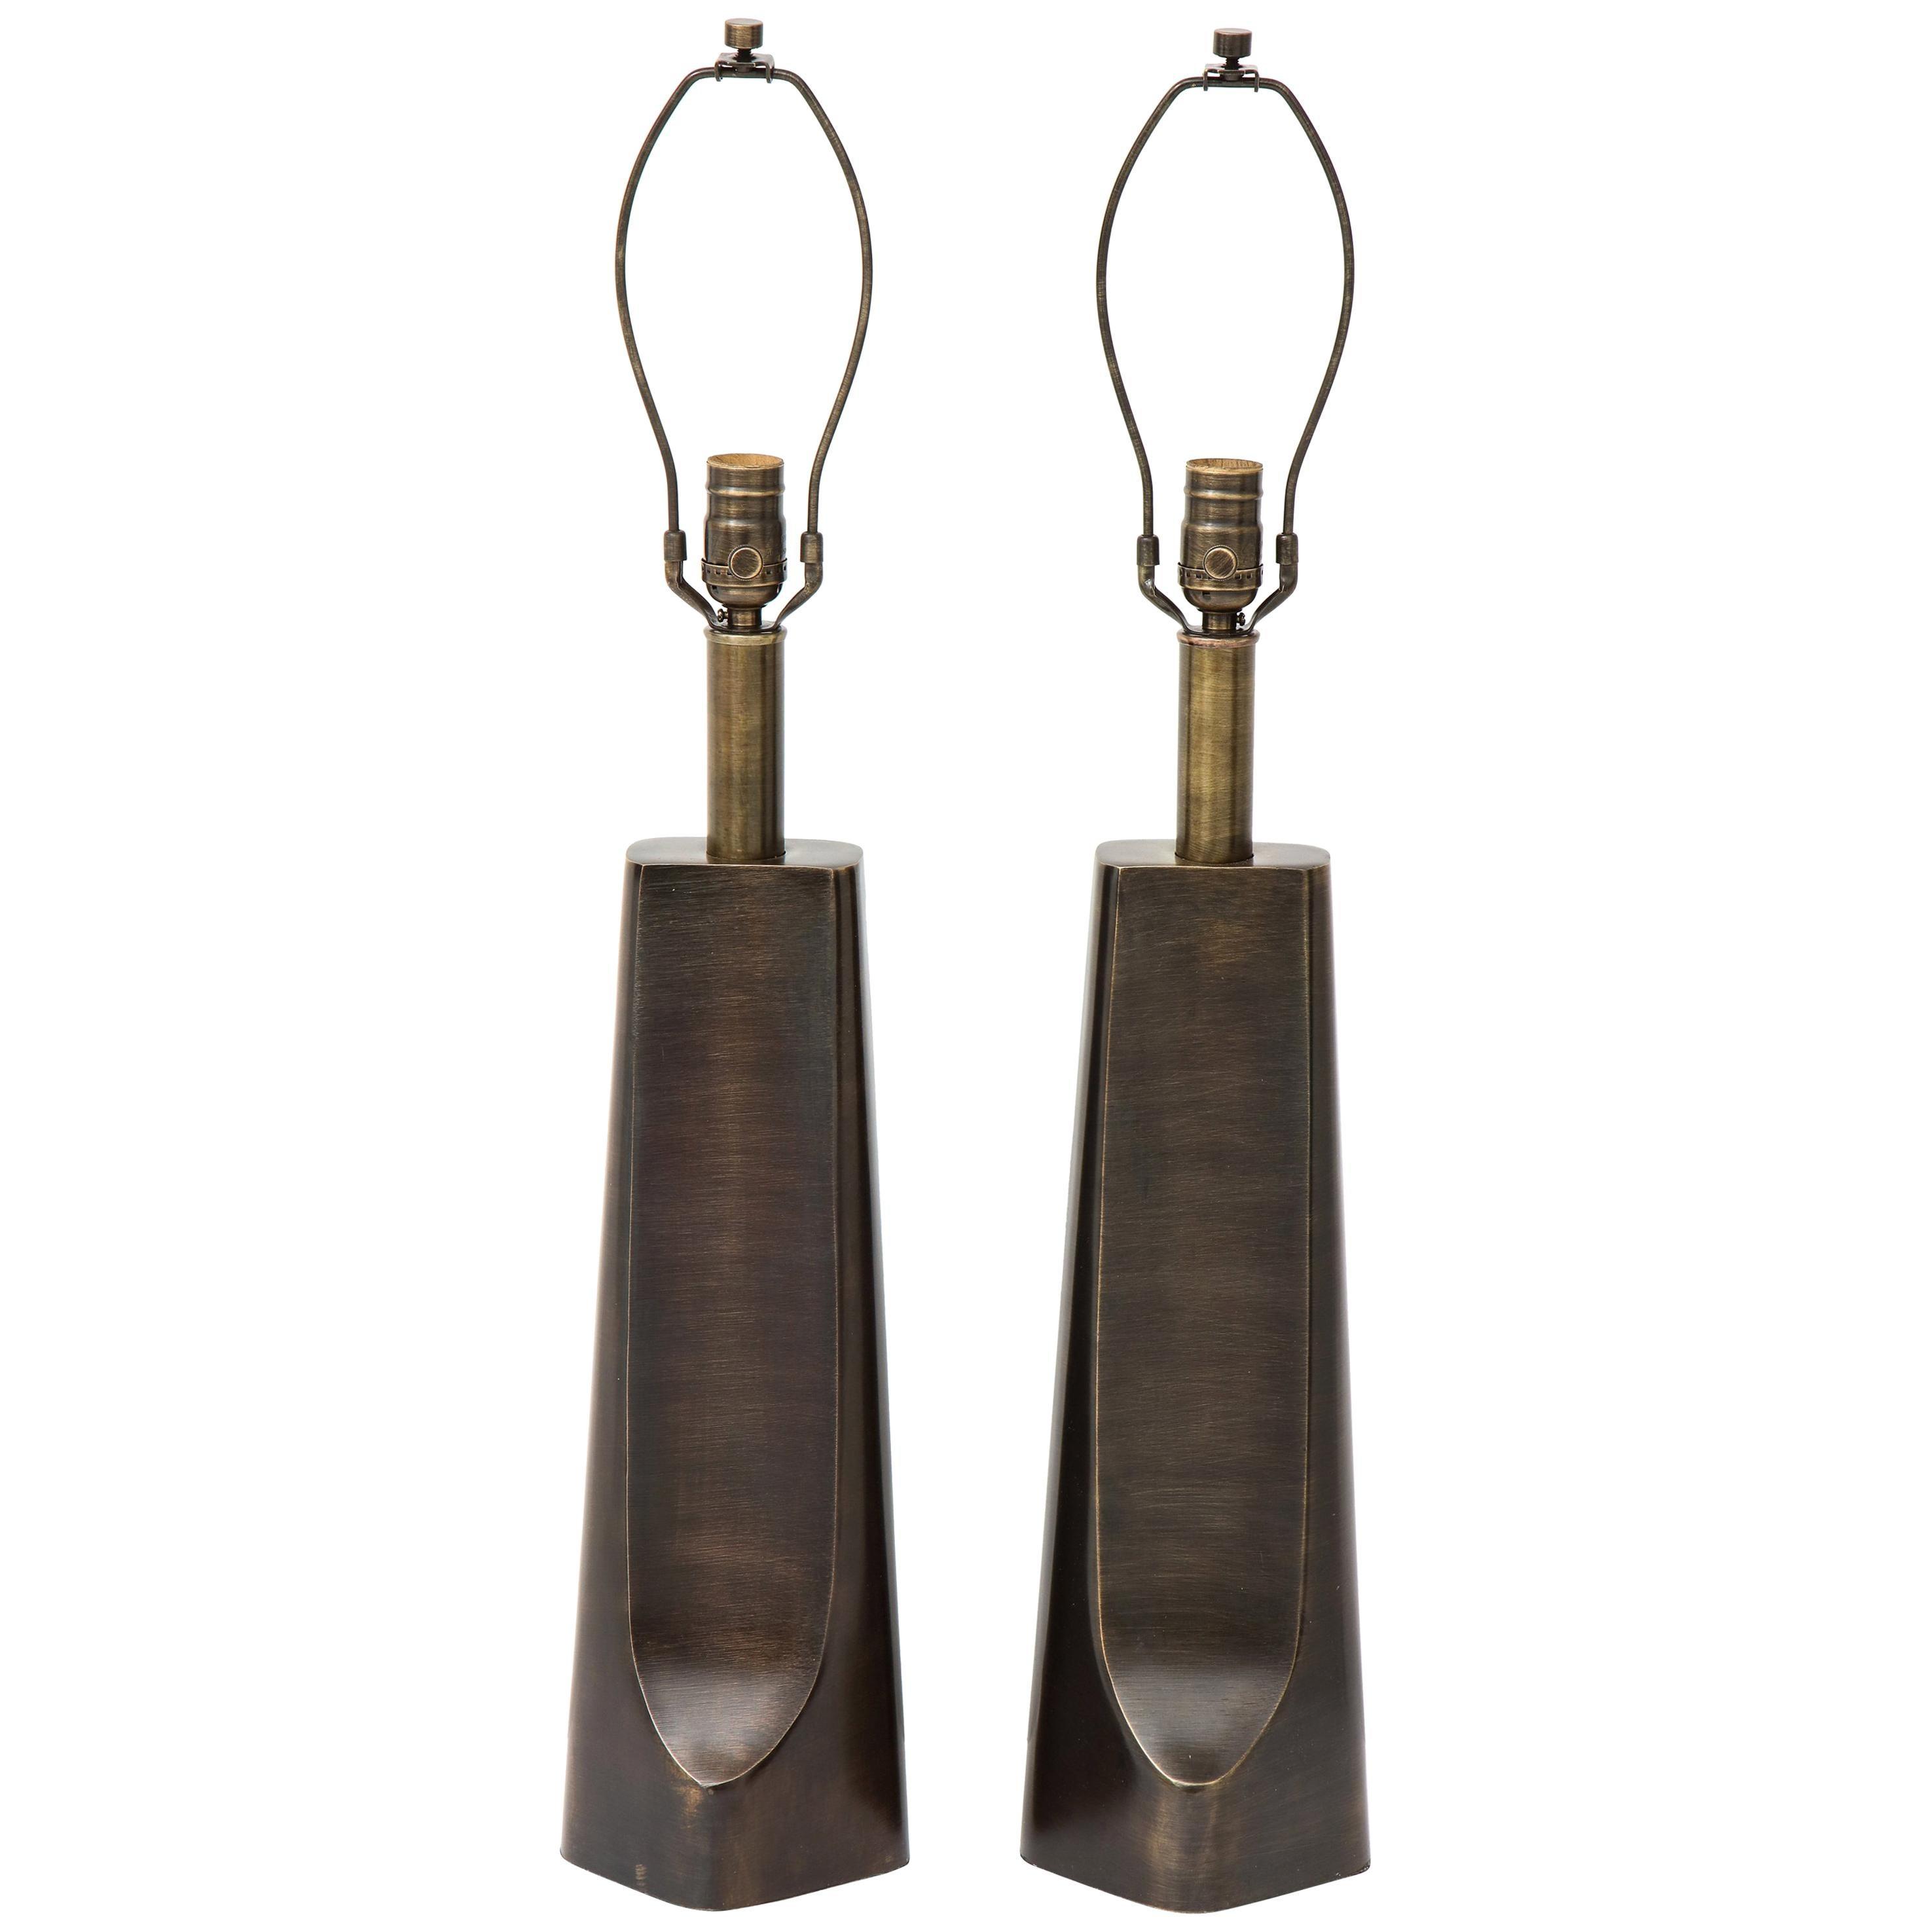 Laurel Aged Bronze Modern Lamps